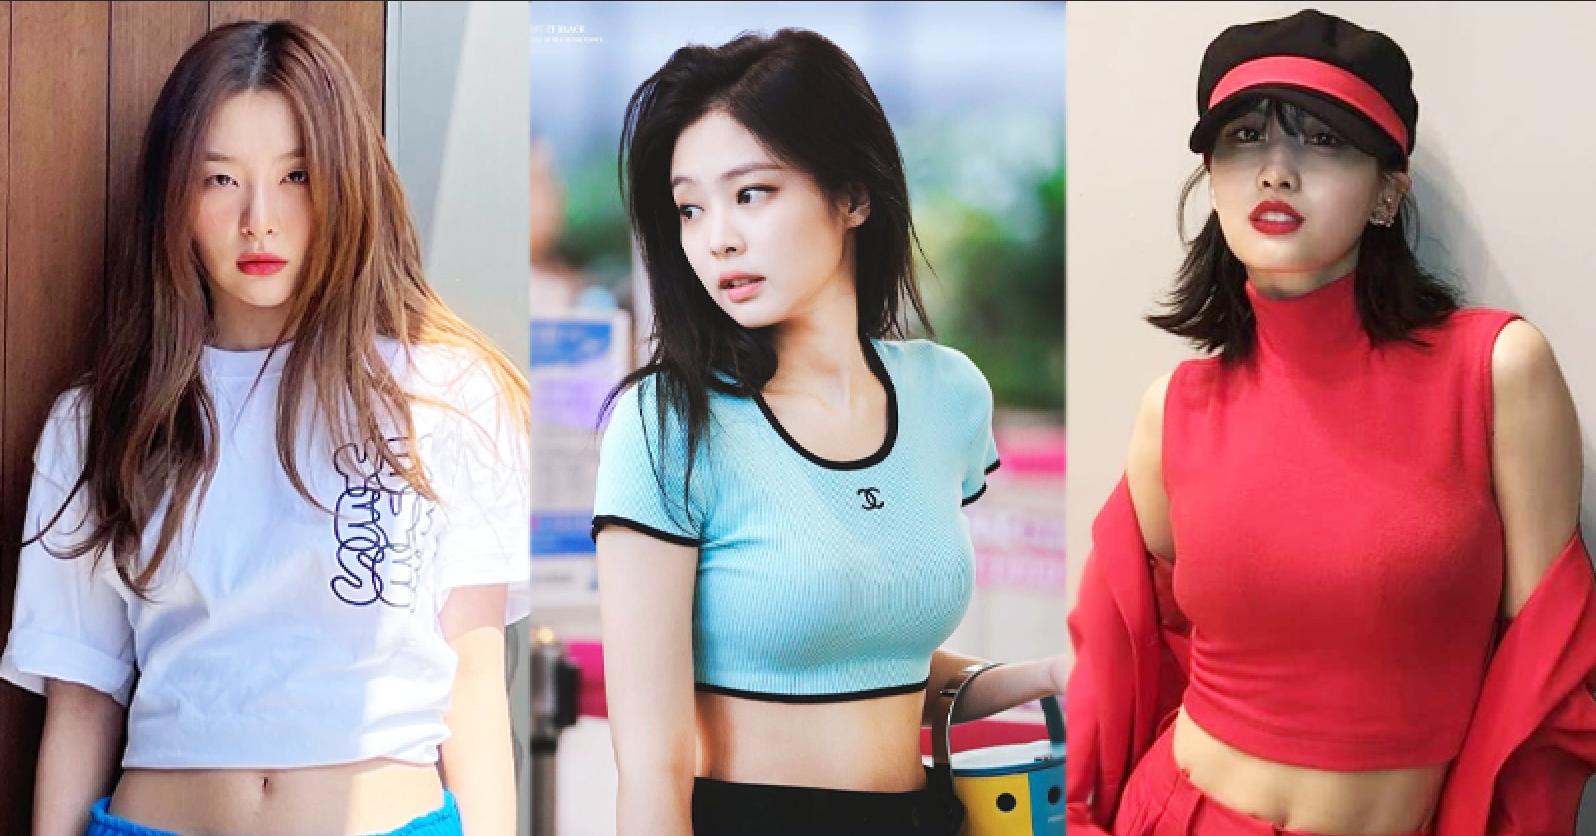 Female Idols Wearing Crop Tops Stirs Controversy in Korea | starbiz.net